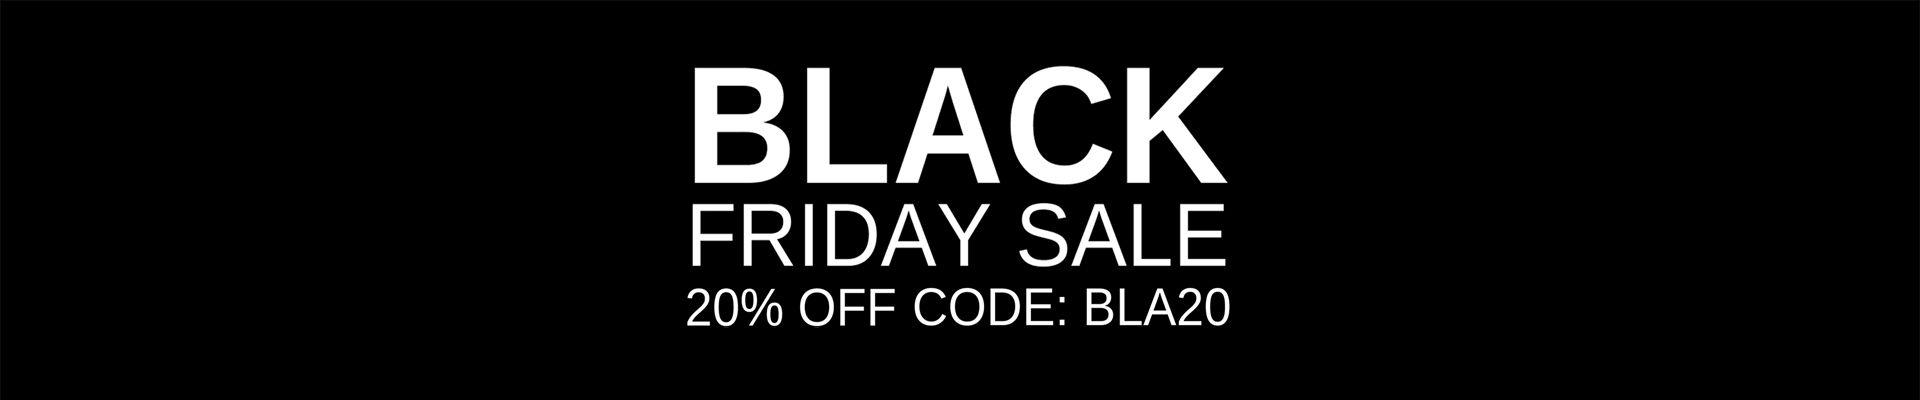 Black Friday Sale, 20% off